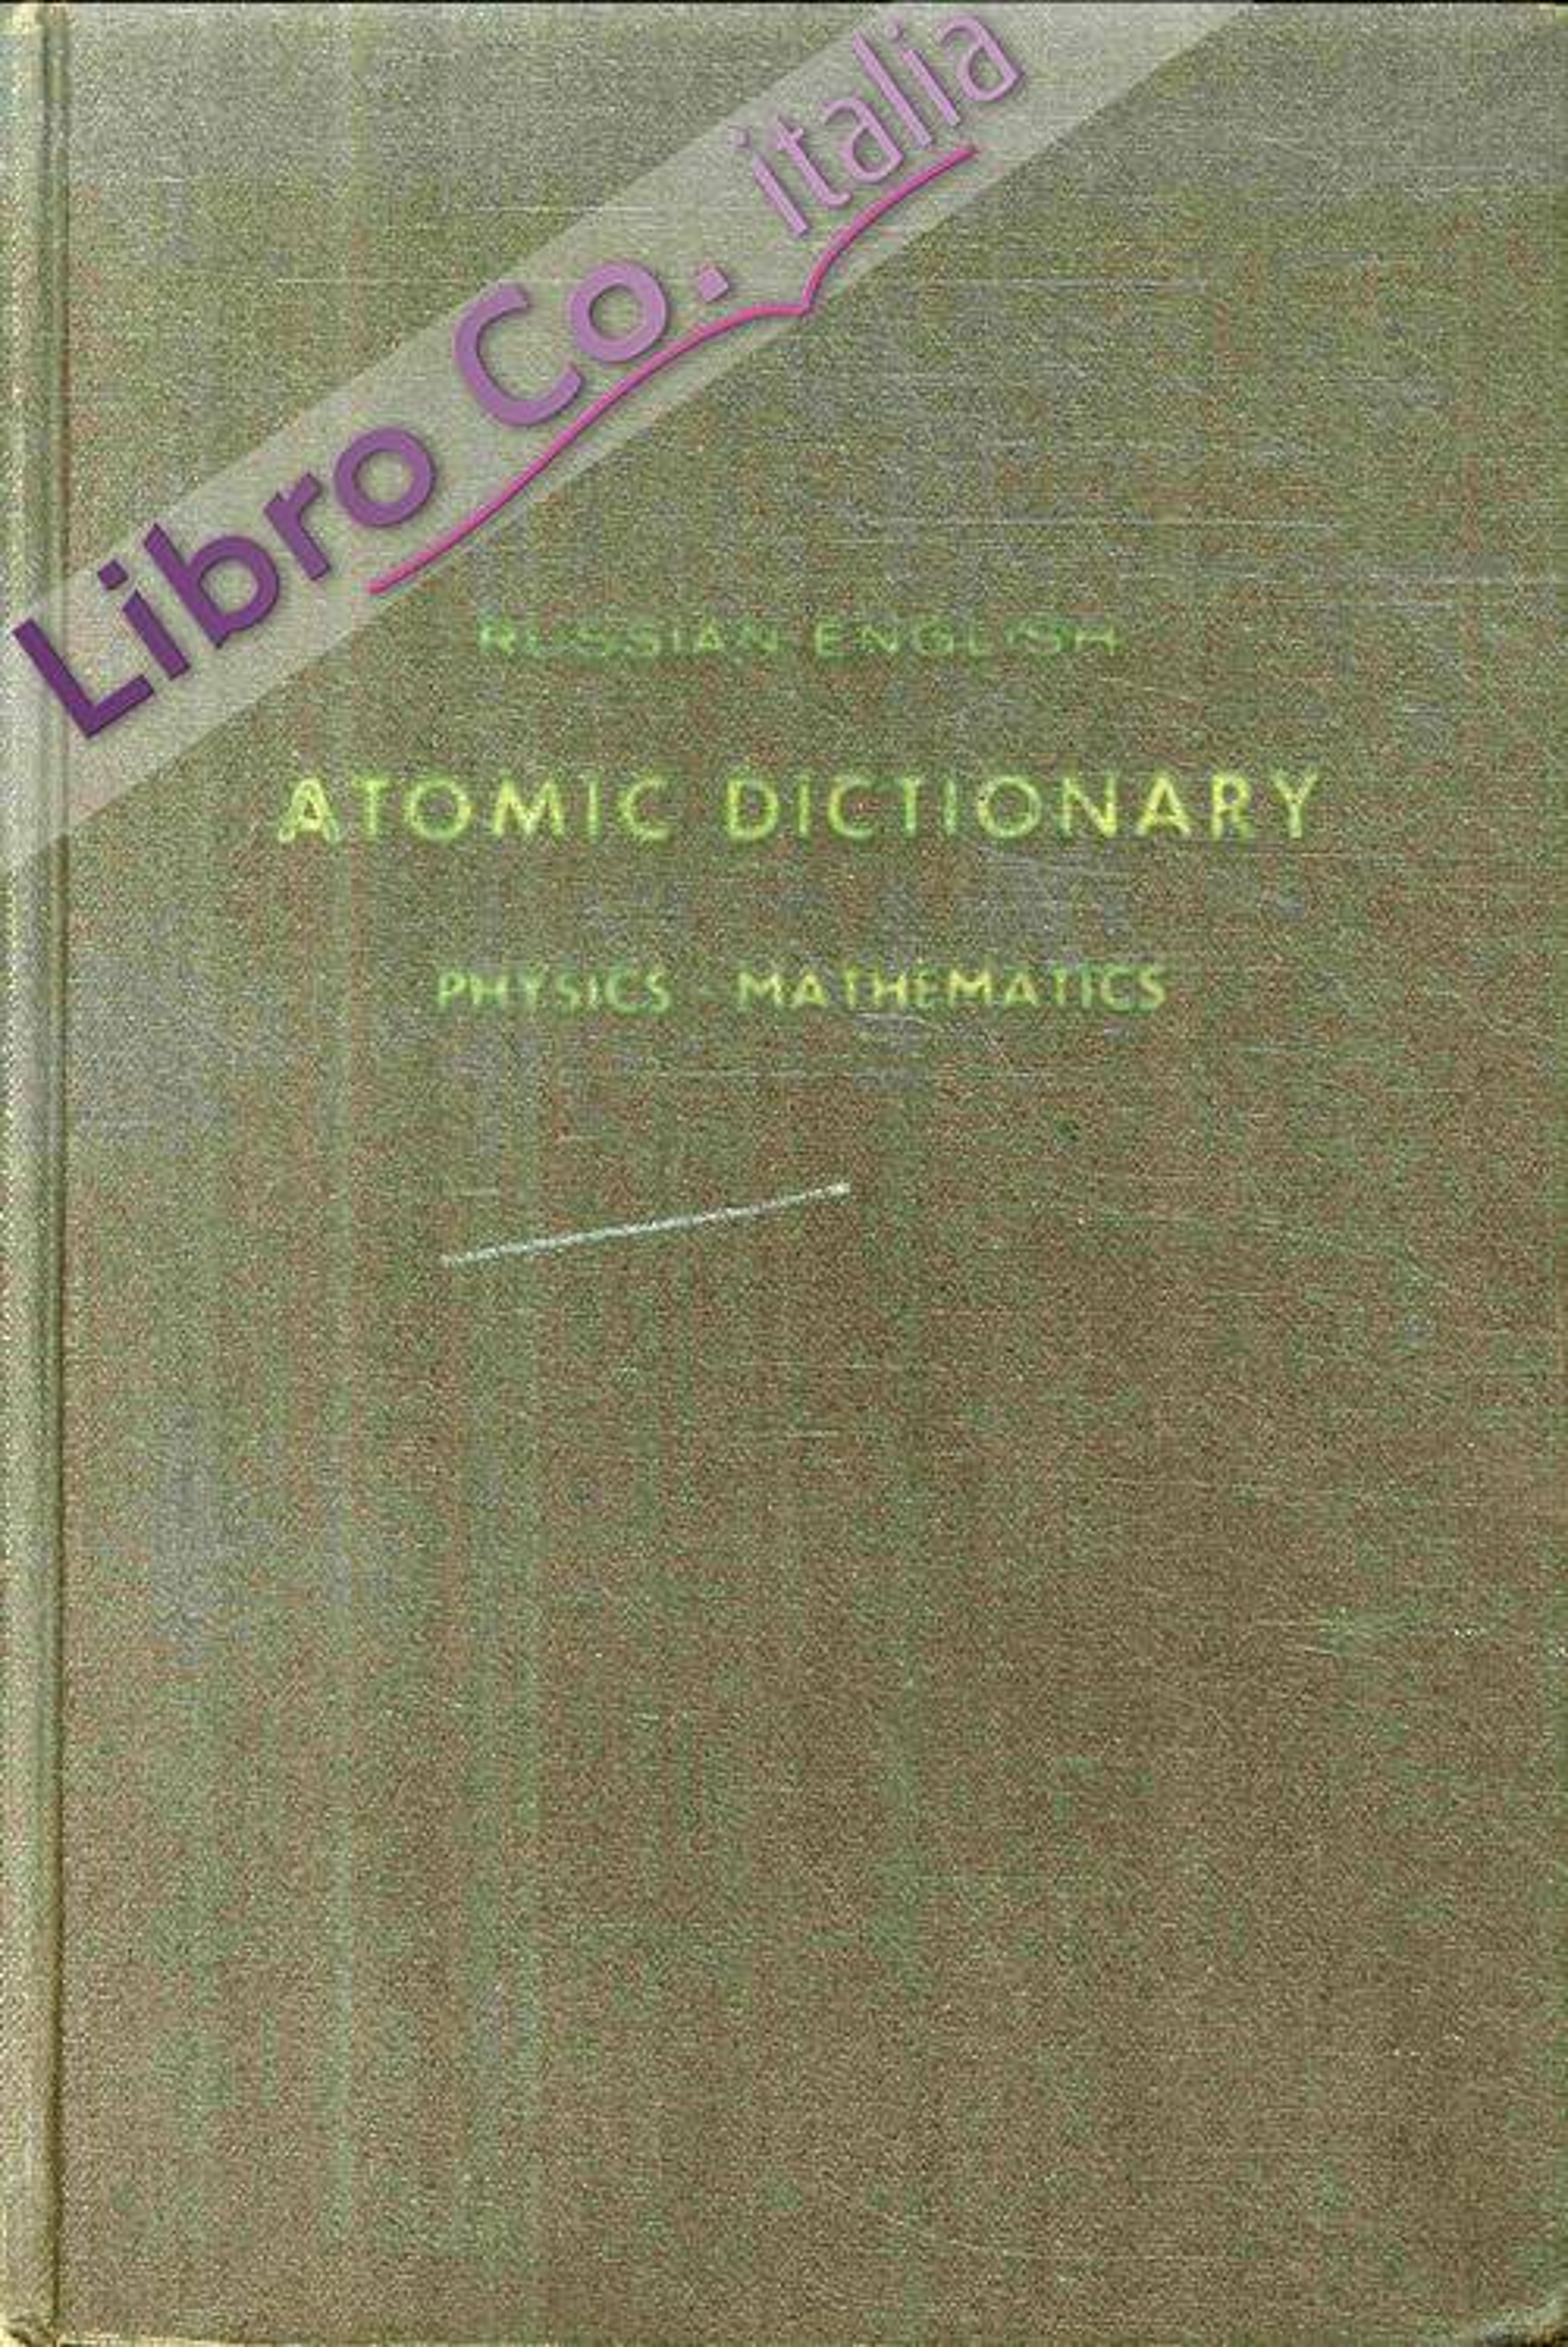 Russian-English Atomic Dictionary. Physics - Mathematics